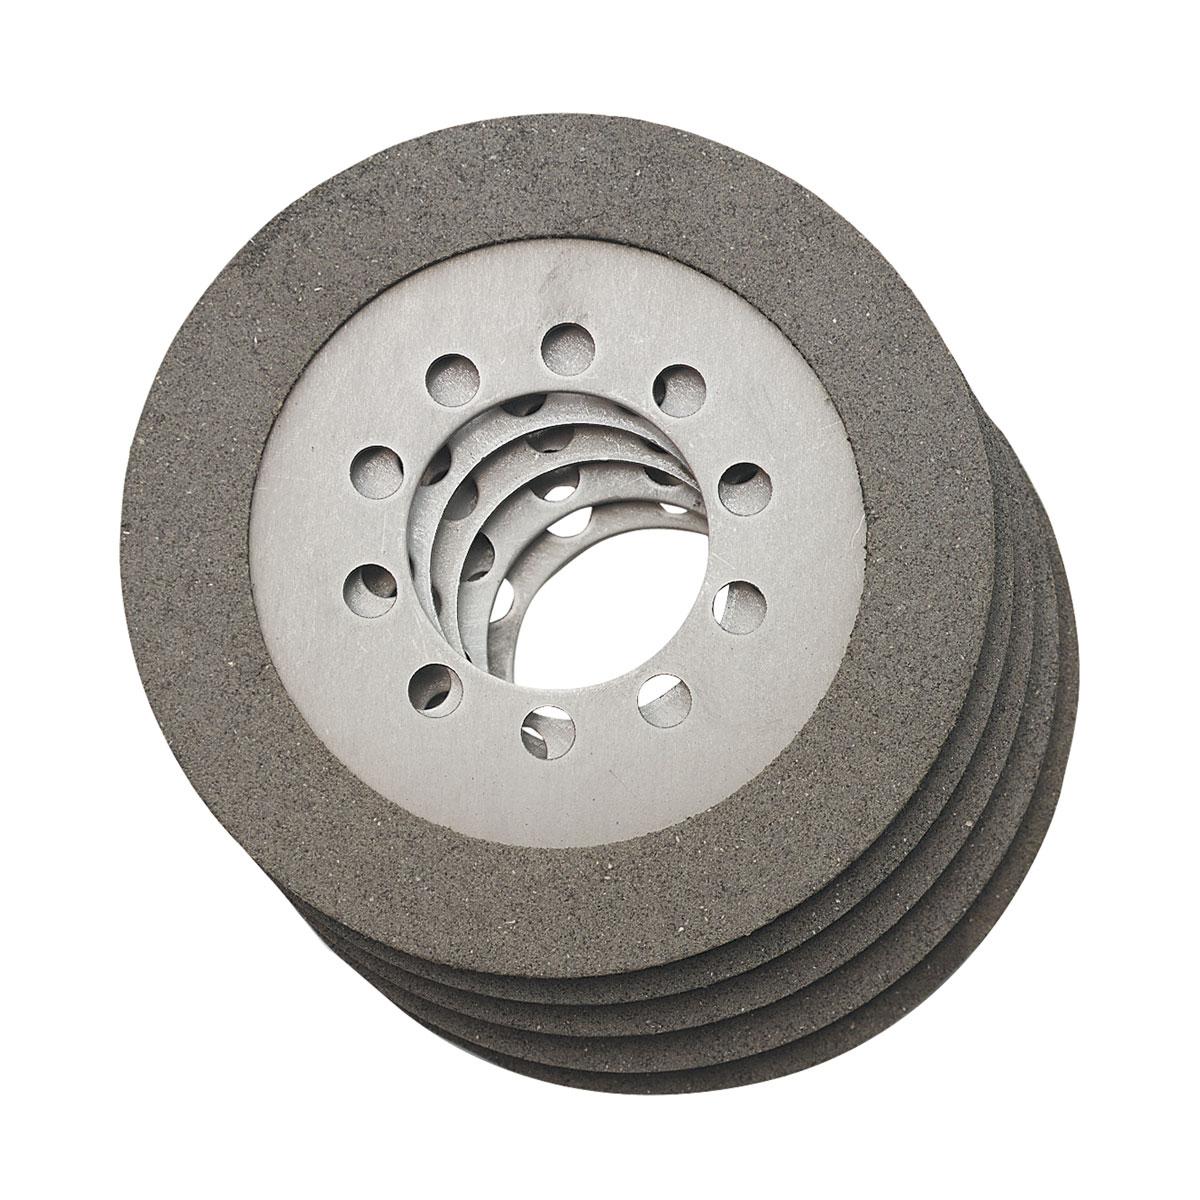 Barnett Performance Products Carbon Fiber Clutch Kit